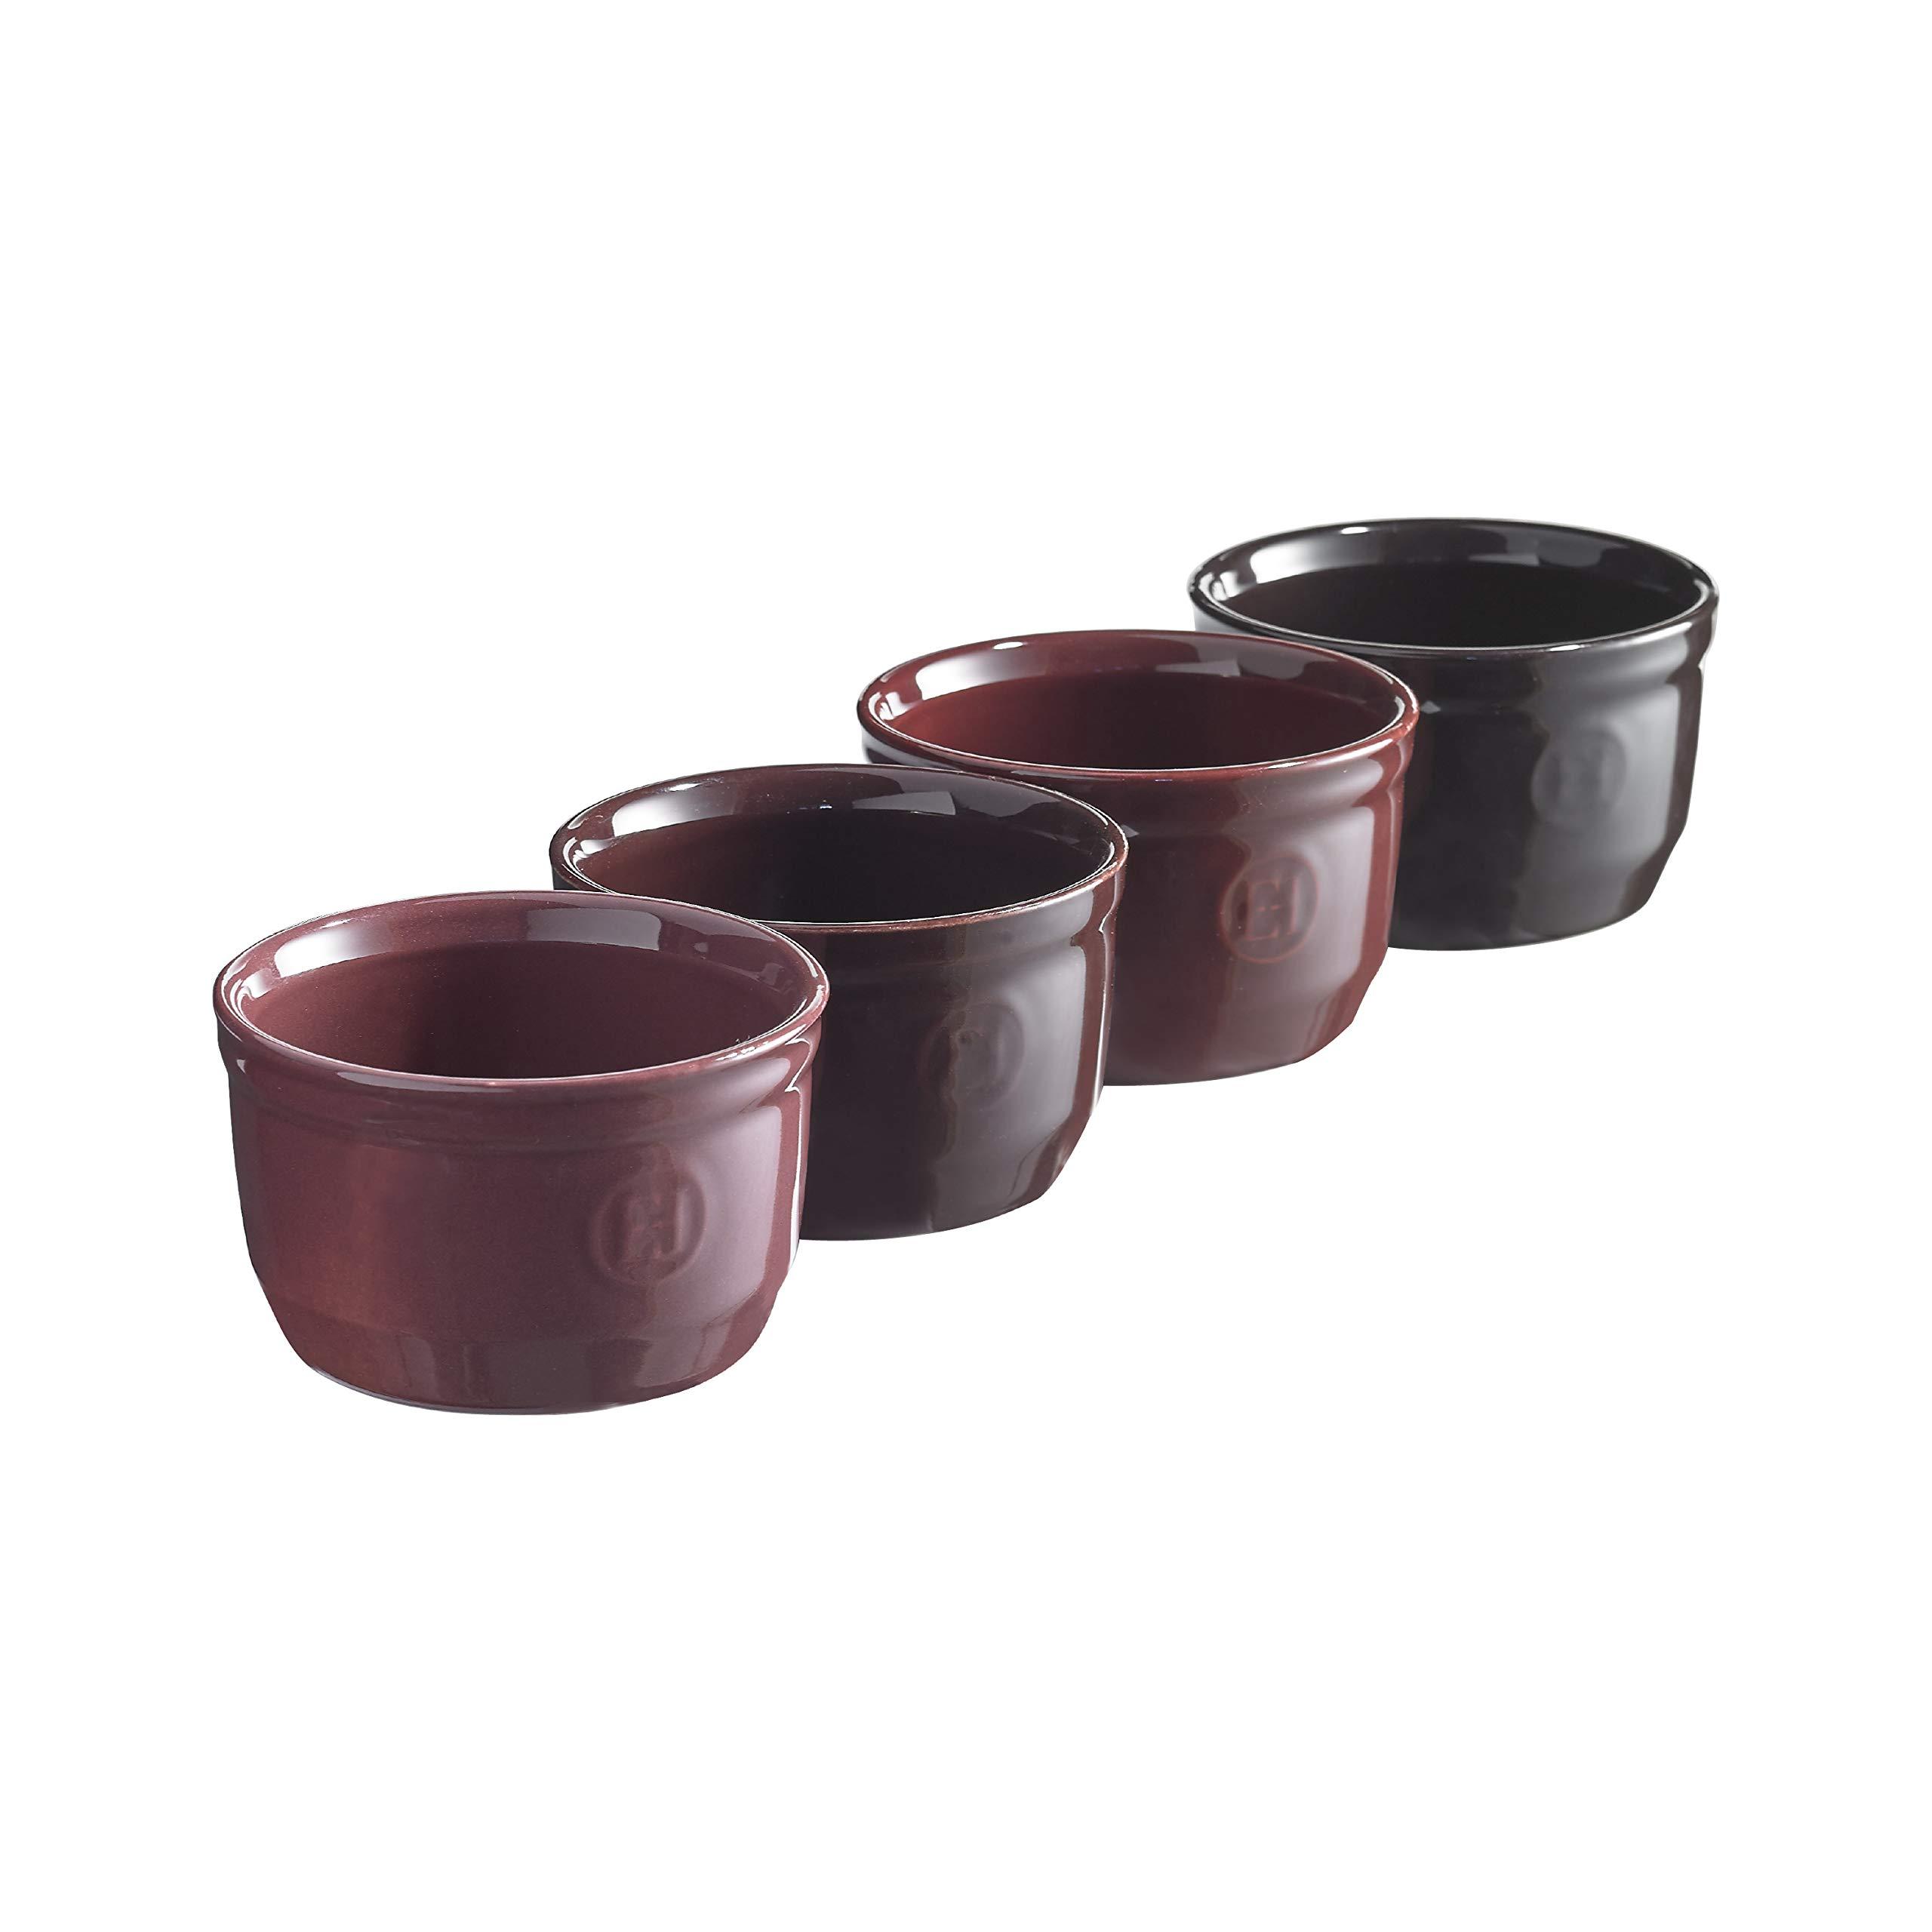 Emile Henry EHSF9710 Fig Shaded, Set of 4 set of individual ramekins, 8.75 oz each each,